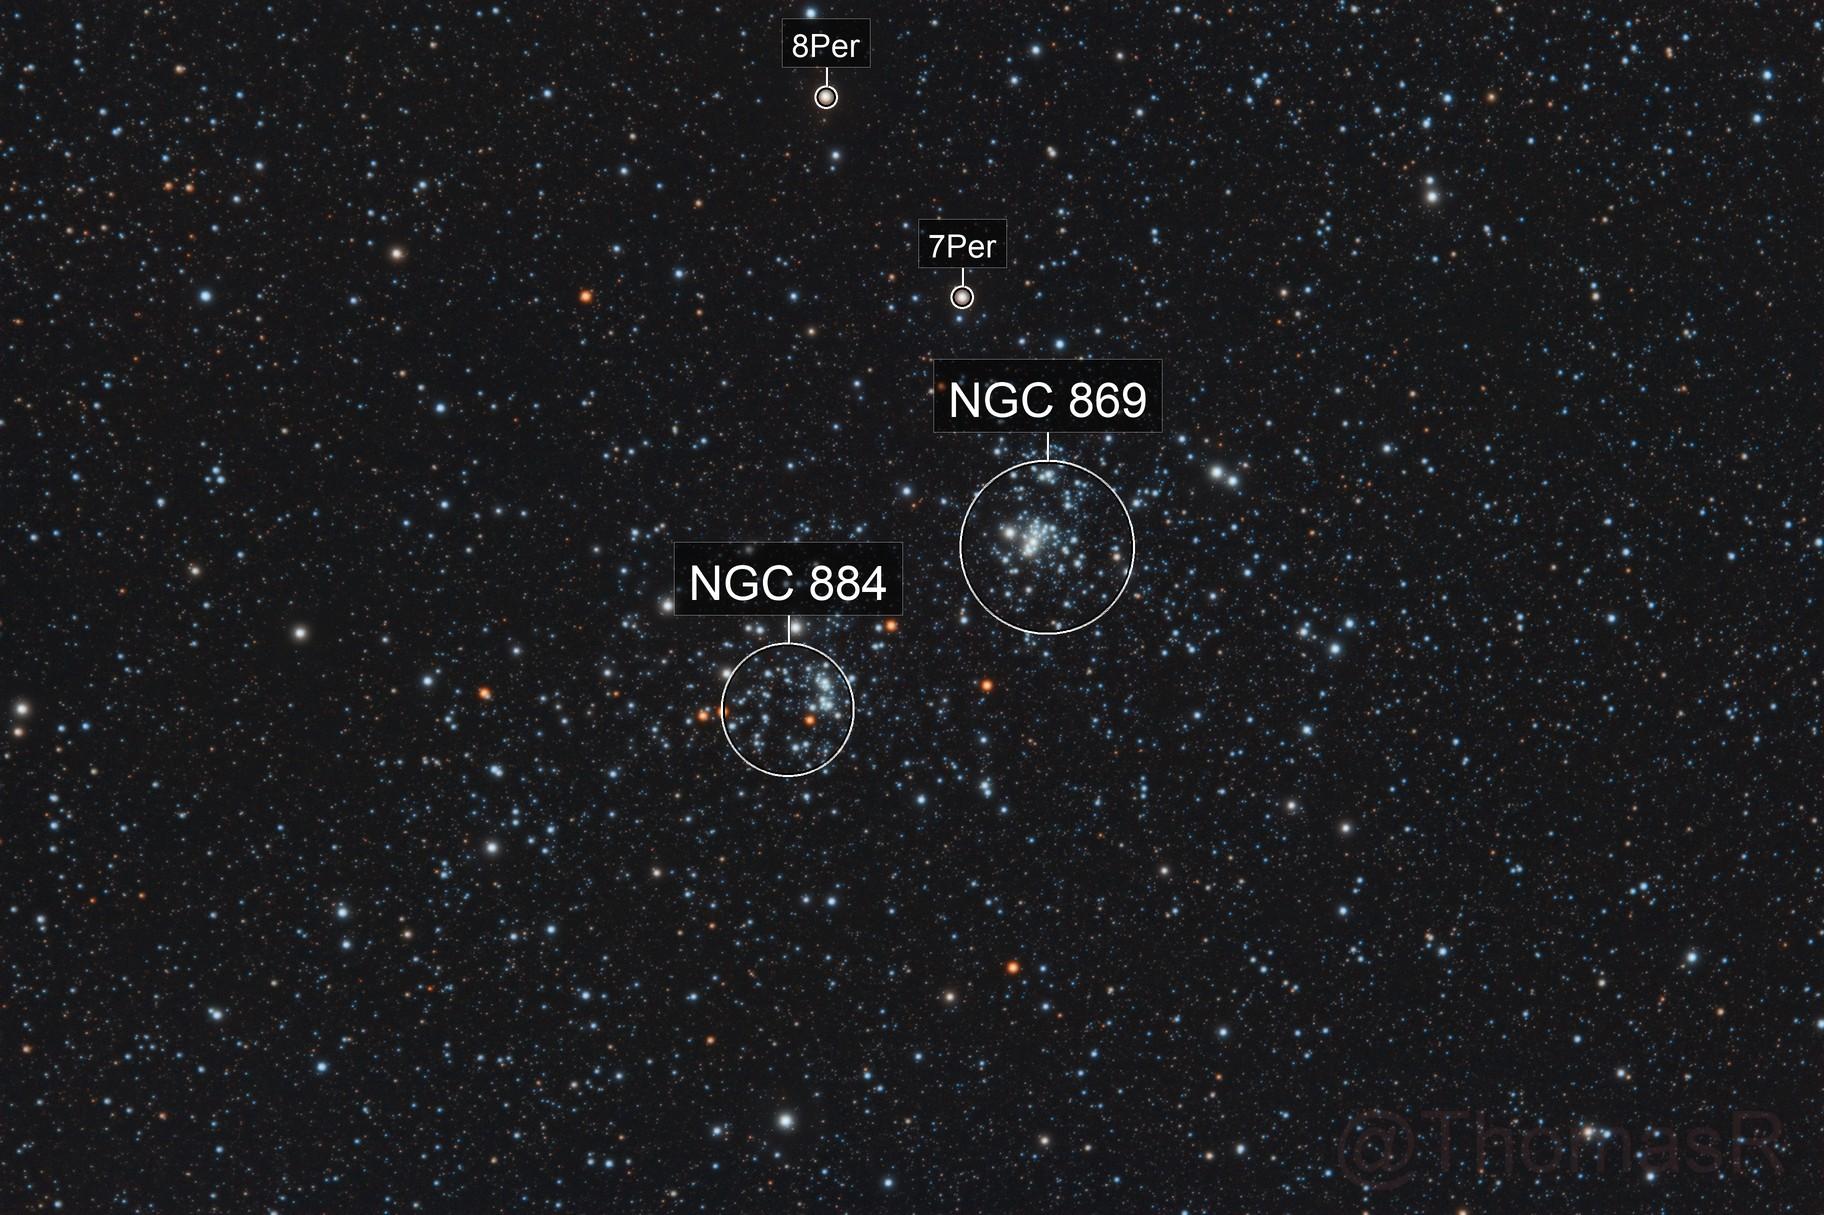 NGC 869 & NGC 884: The Double Cluster